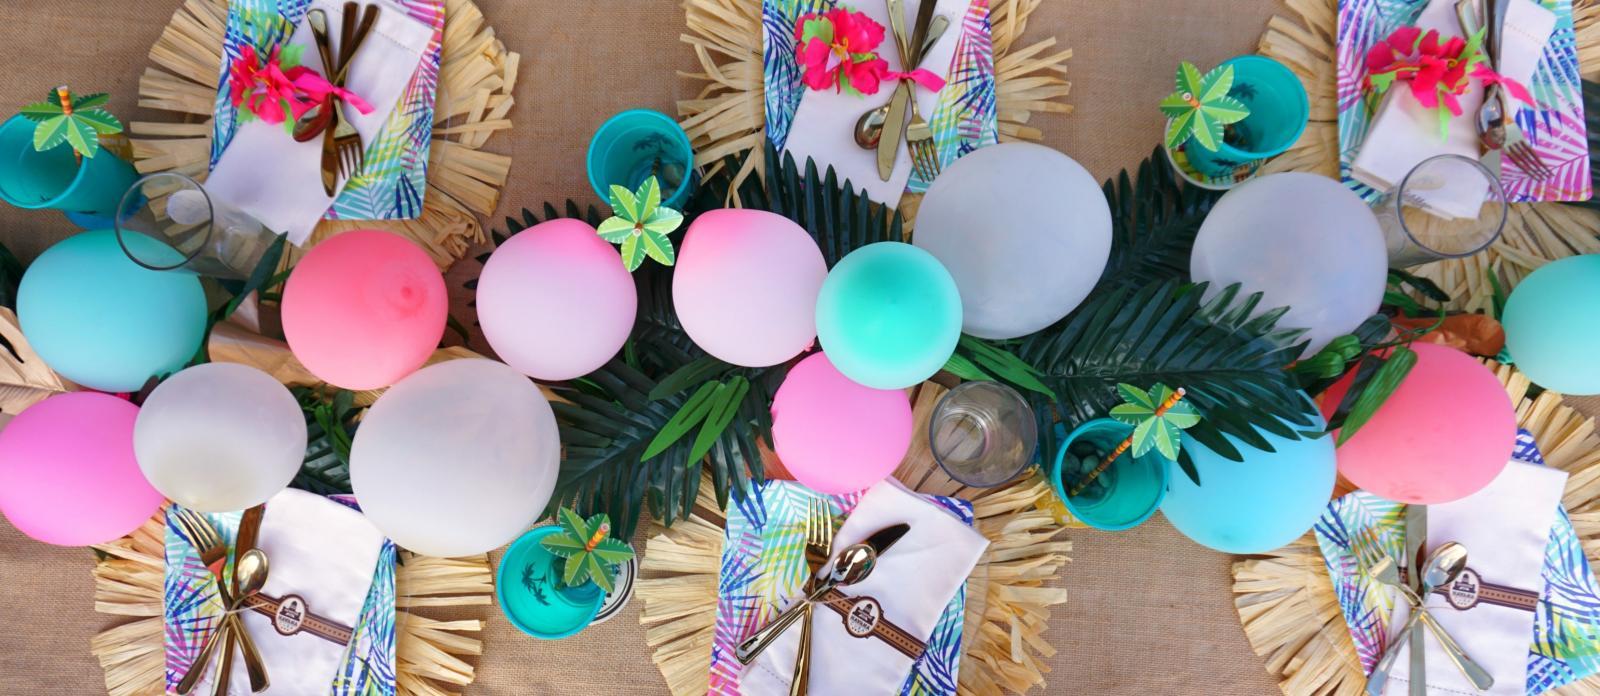 Diy Tropical Palm Frond Table Runner Garland Fun365